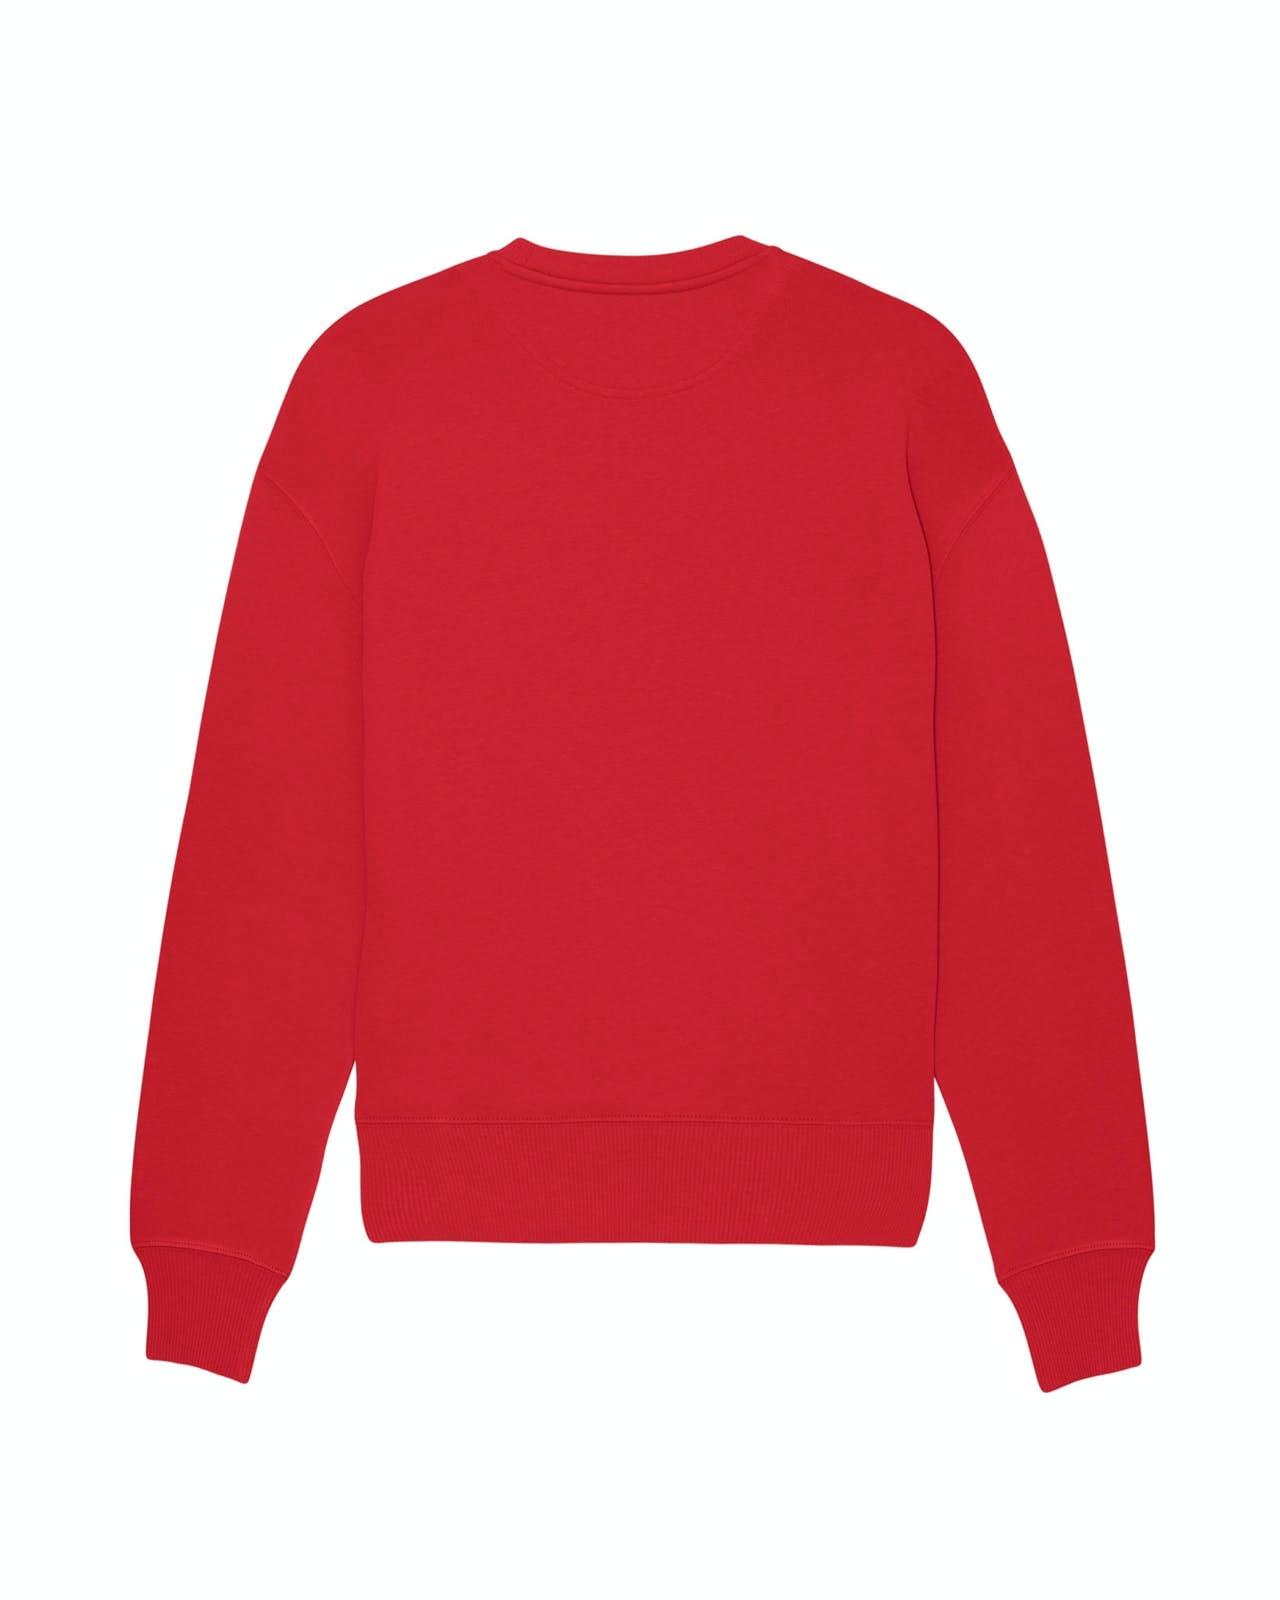 GOAT Apperal Goat Bobby Unisex Oversized Sweat Red